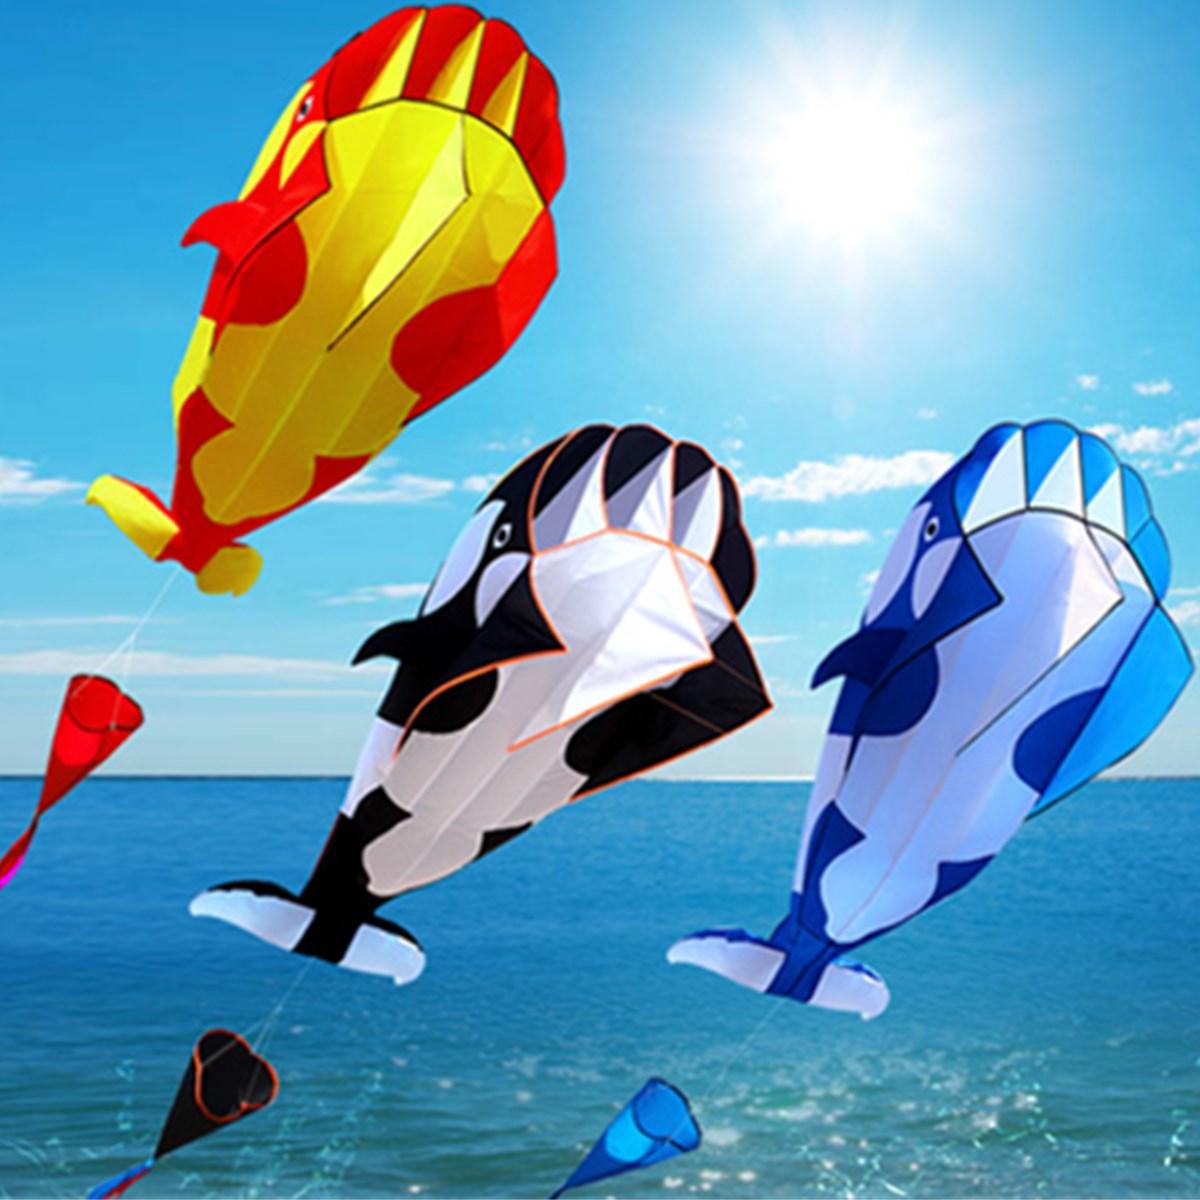 3d Cartoon Whale Kite For Children Software Kite Kids